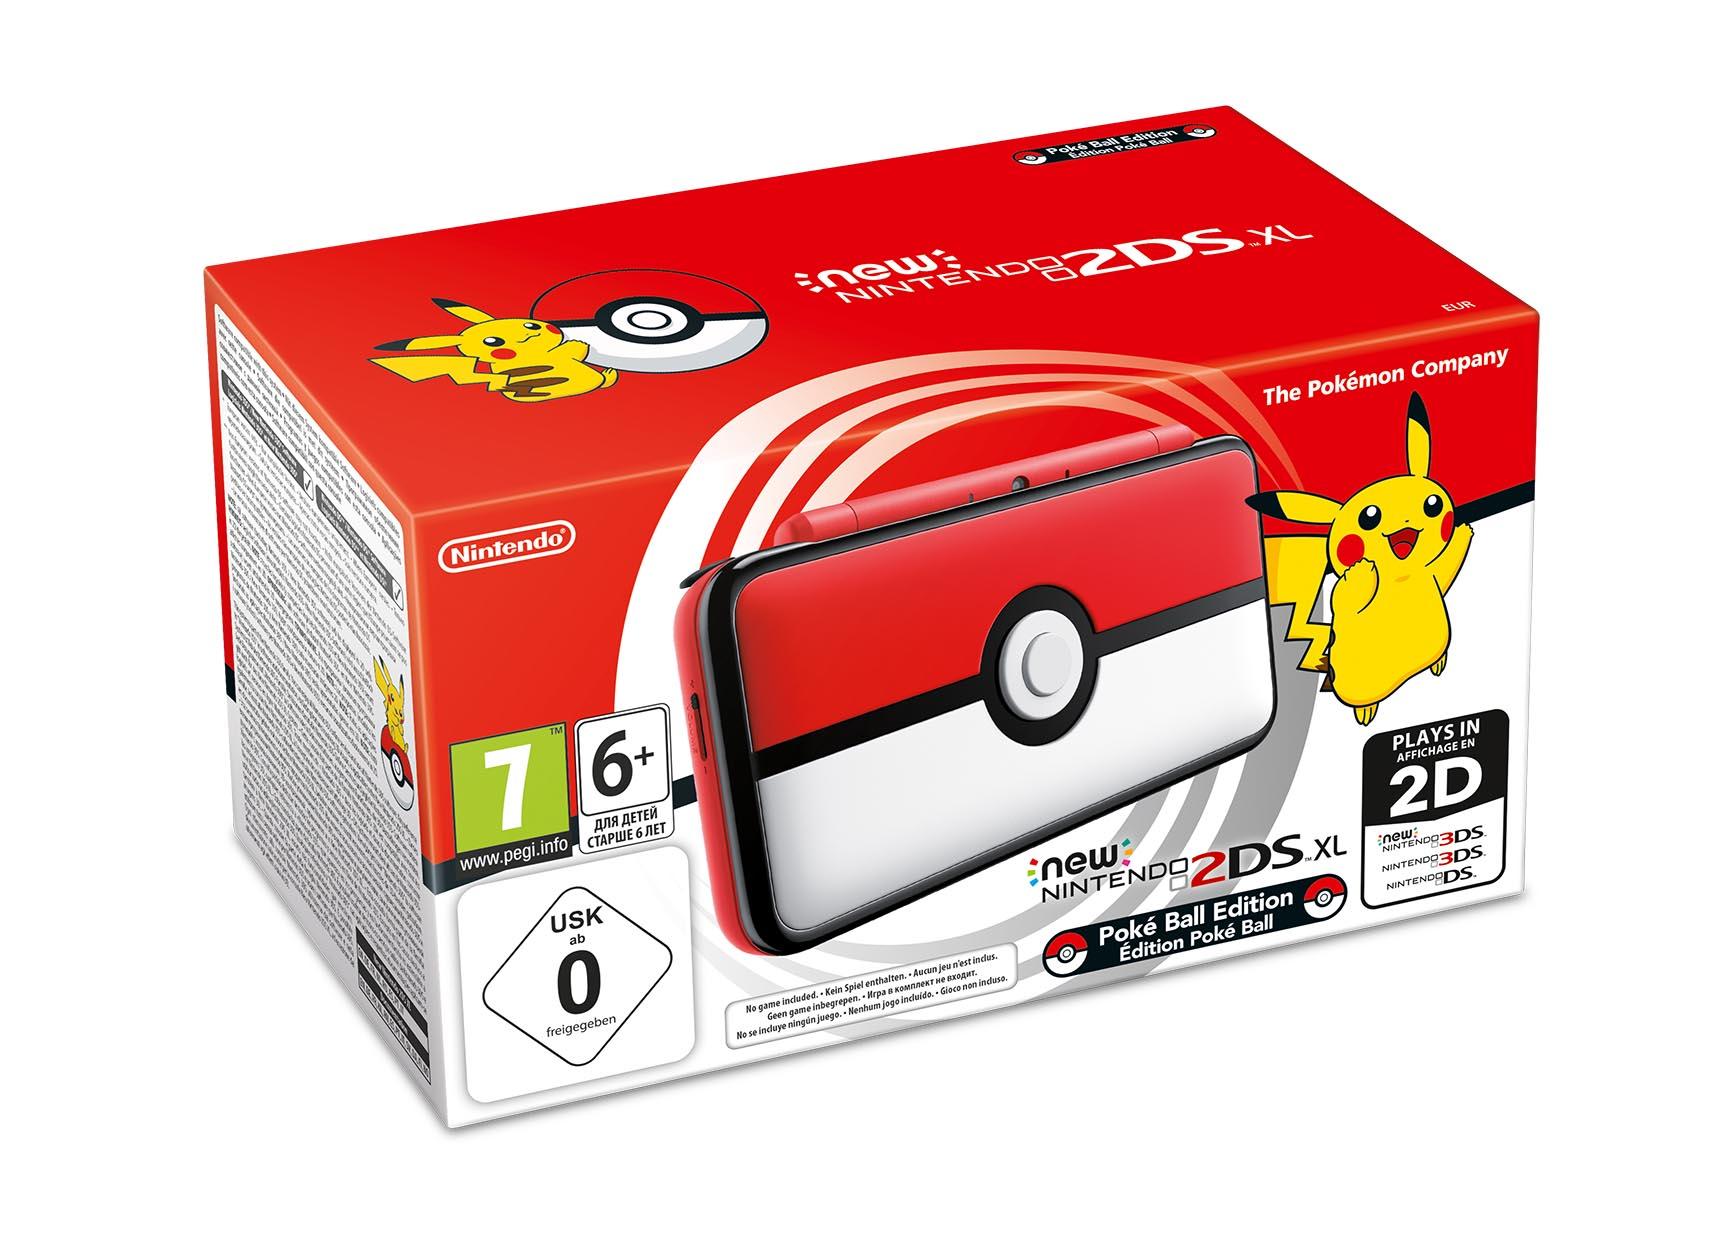 New Nintendo 2DS XL Pokémon Box